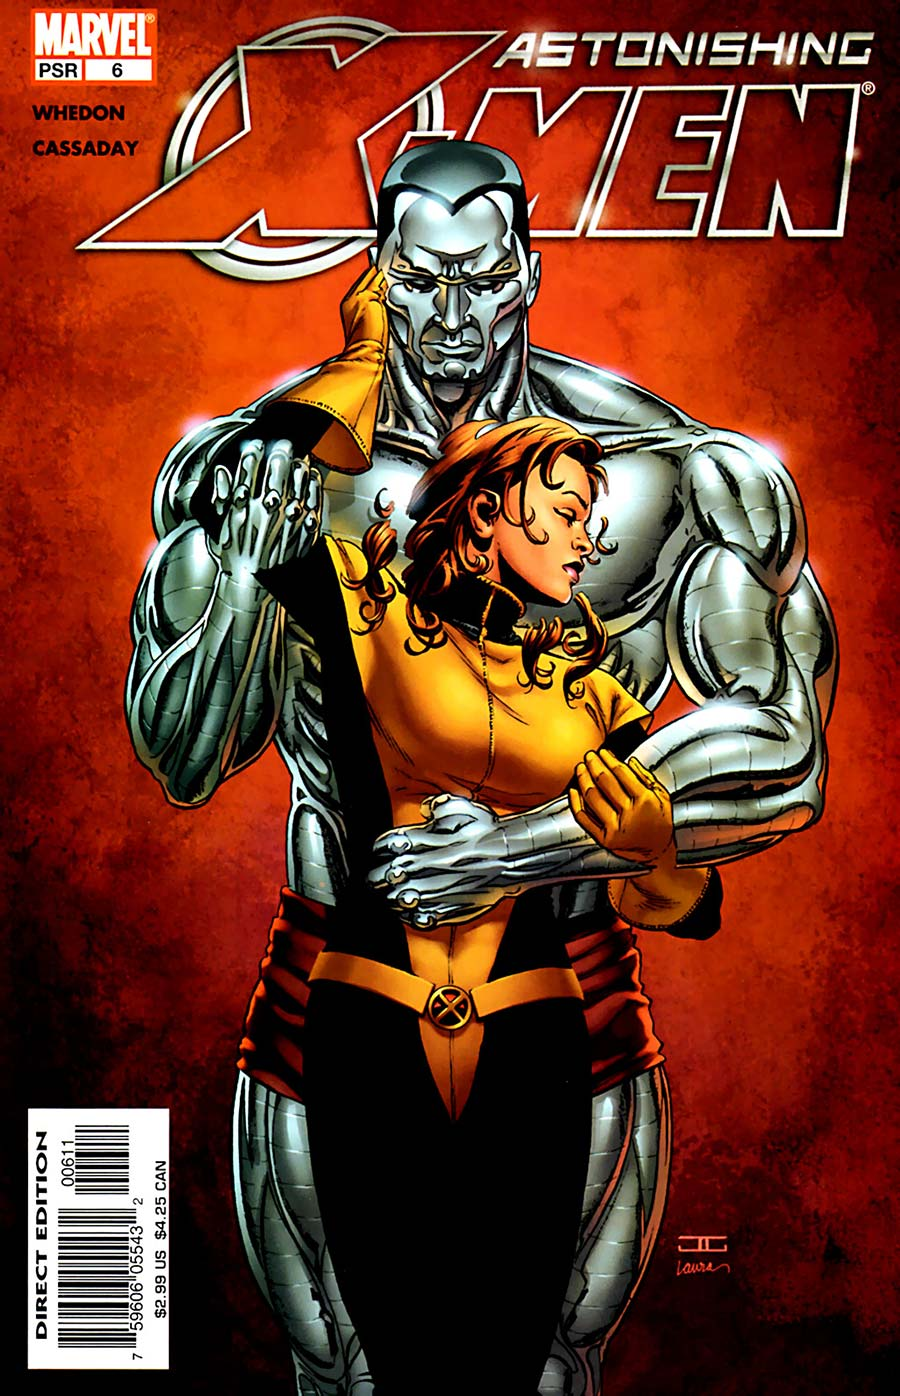 Astonishing X-Men (Whedon/Cassaday)